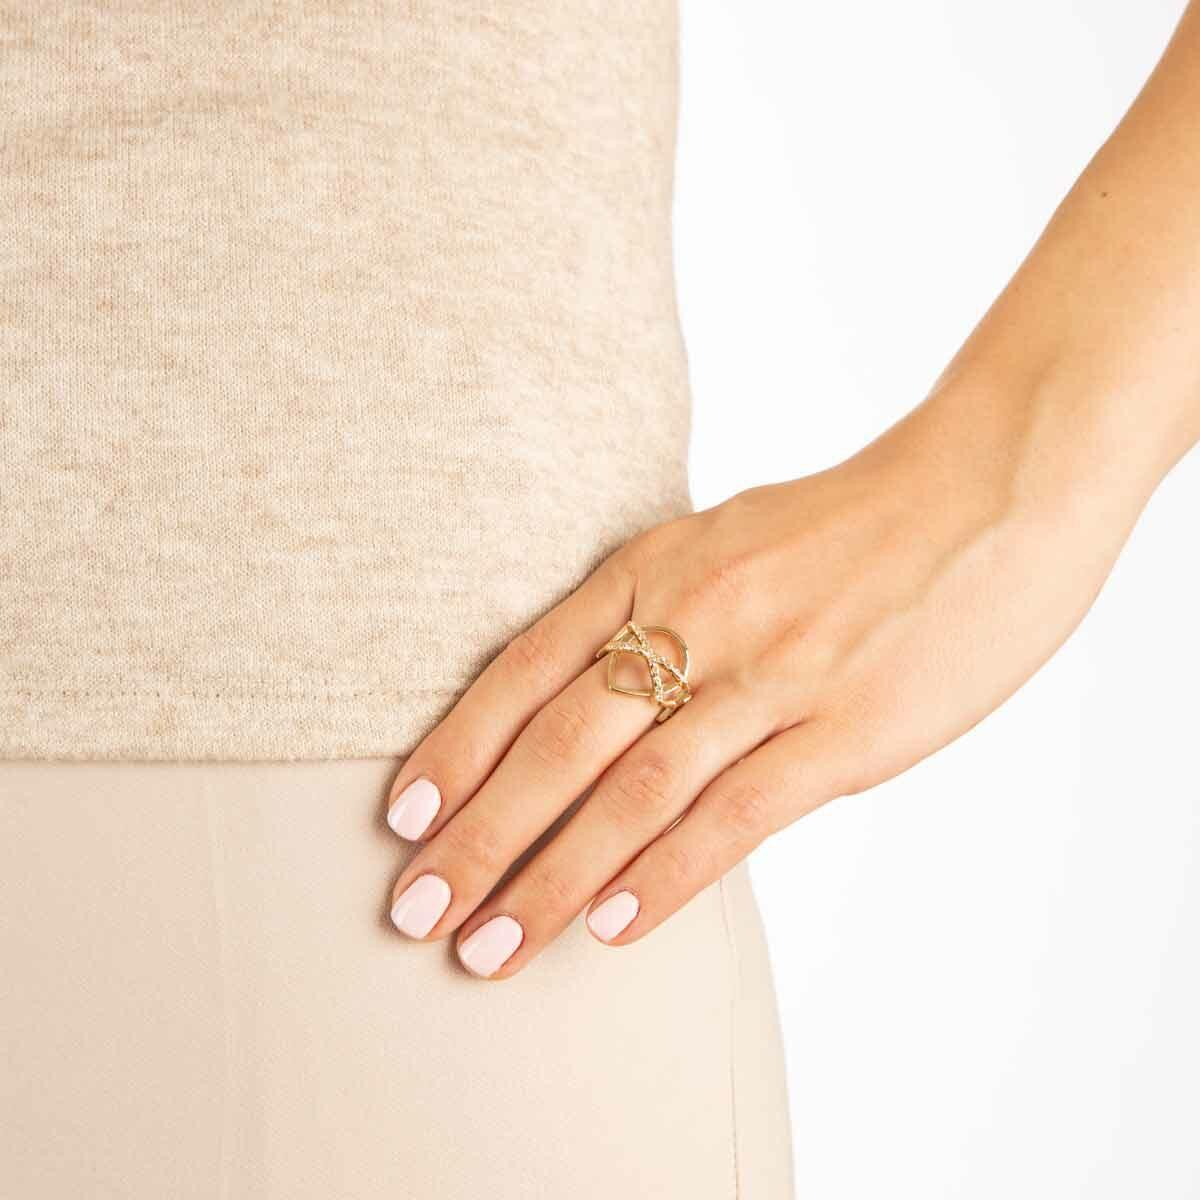 انگشتر طلا الیکا پرسته